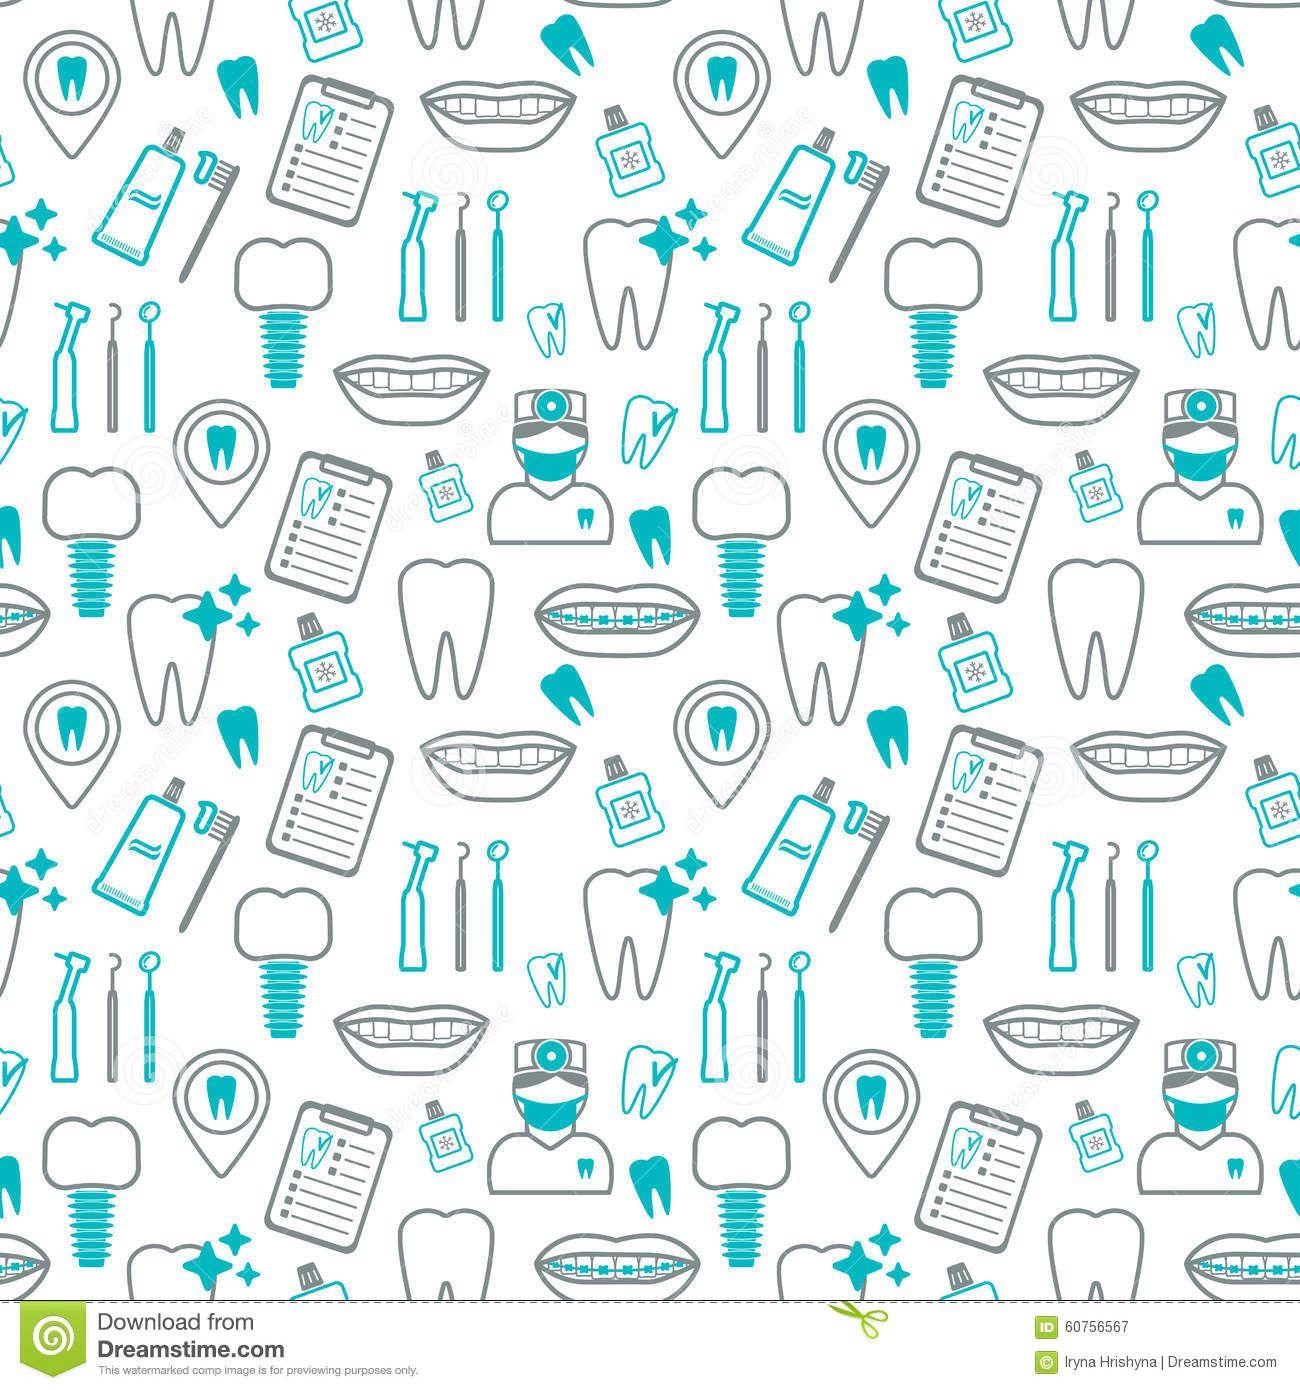 Pin de Marlen Amador en Consultorio Dental | Pinterest | Odontología ...